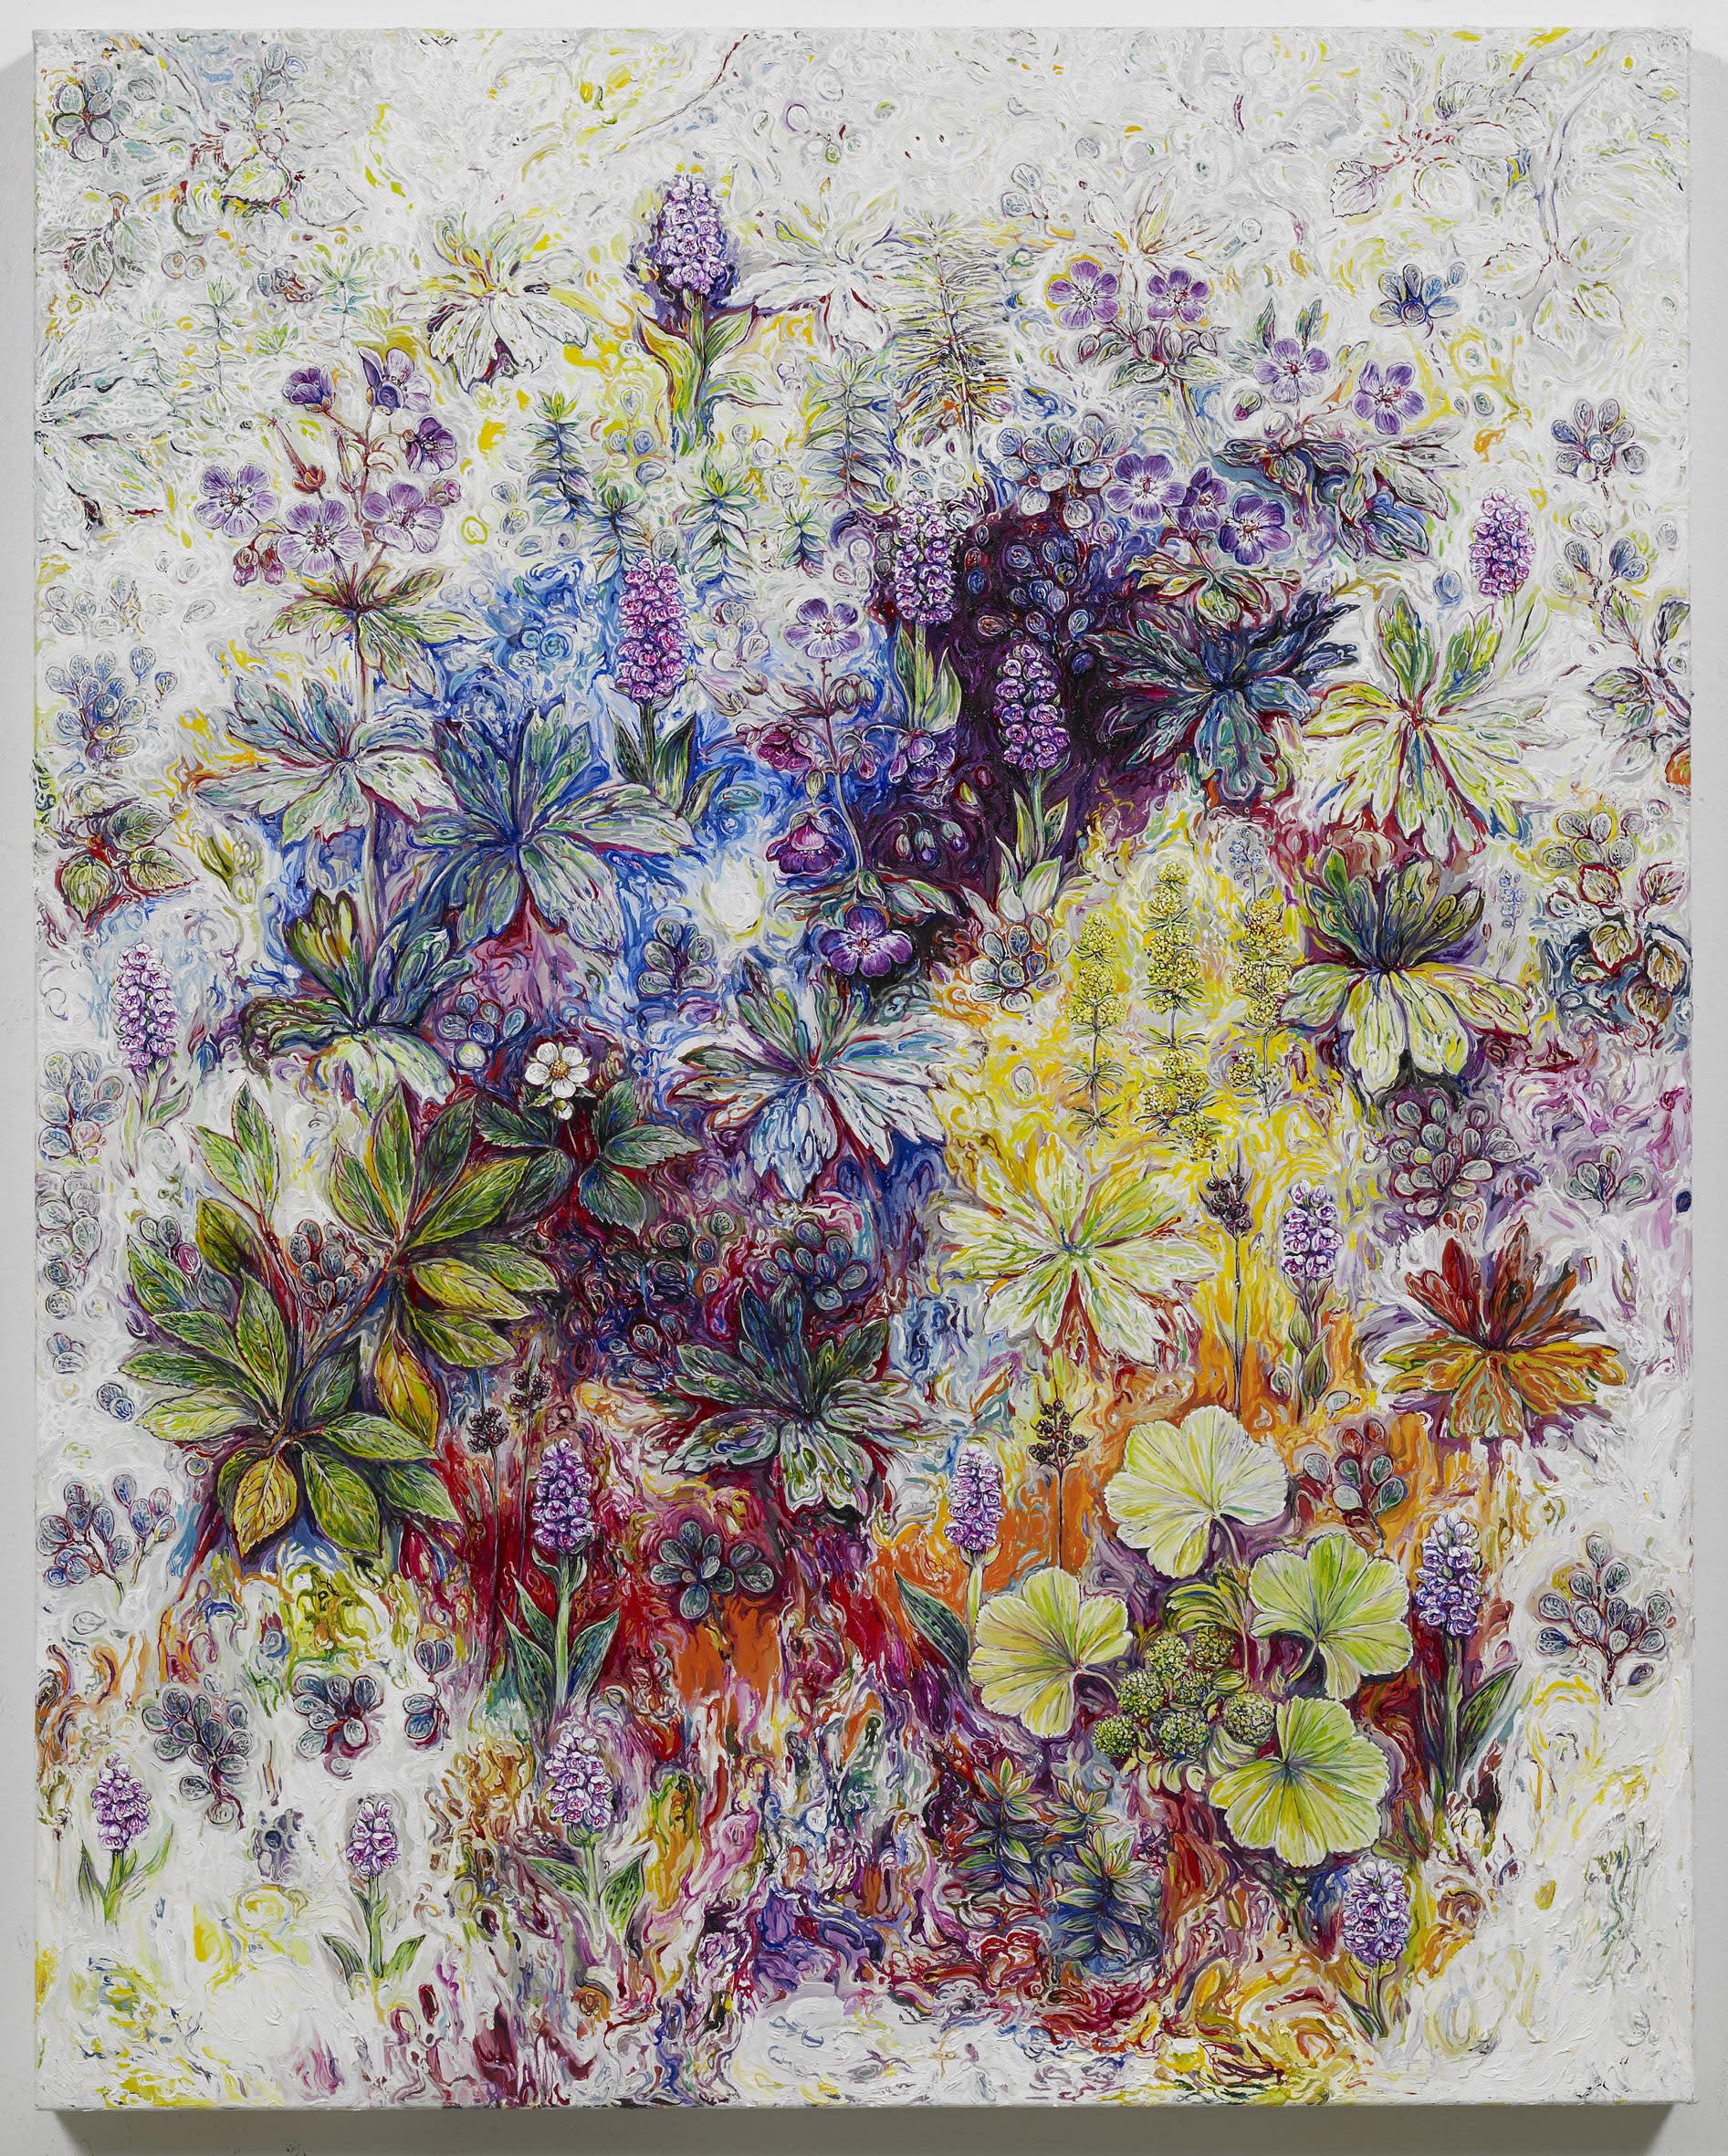 "<span class=""link fancybox-details-link""><a href=""/exhibitions/128/works/artworks8843/"">View Detail Page</a></span><div class=""artist""><strong>EGGERT PÉTURSSON</strong></div><div class=""title""><em>Untitled / Án titils (Blágresi og Brönugrös í birtu)</em>, 2011-2012</div><div class=""signed_and_dated"">signed on back</div><div class=""medium"">oil on canvas / olía á striga</div><div class=""dimensions"">100.0 x 80.0 cm<br>39 1/8 x 31 3/16 in</div>"